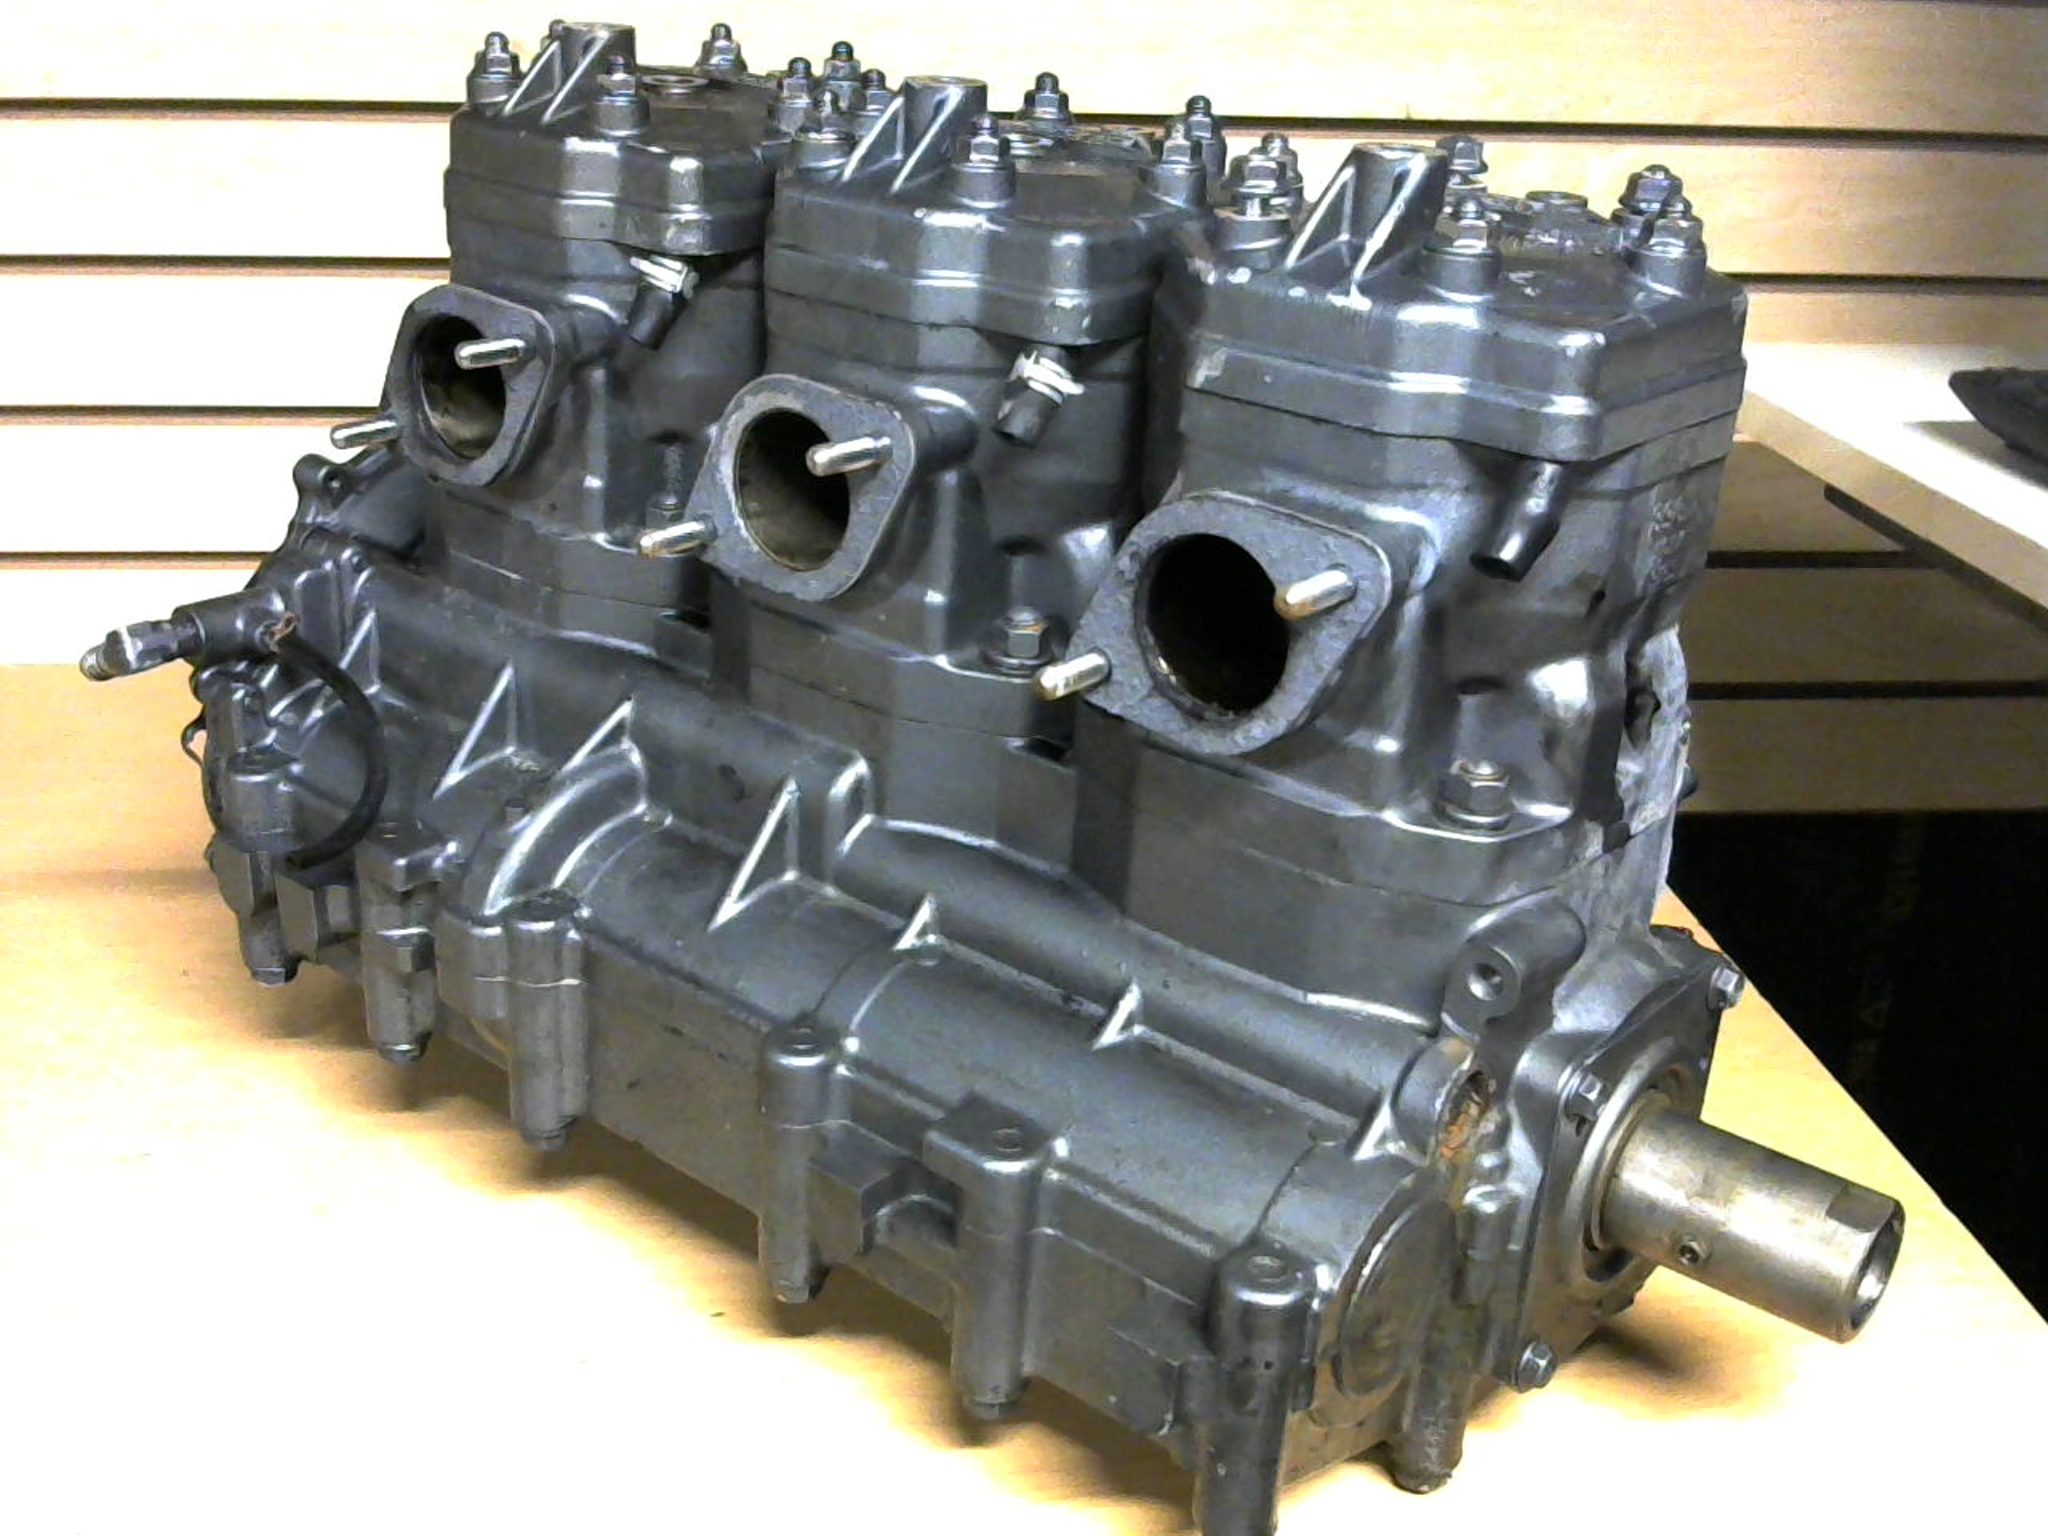 1996 Tigershark Monte Carlo 900 Engine 0662-173-a - Used Jetski Parts